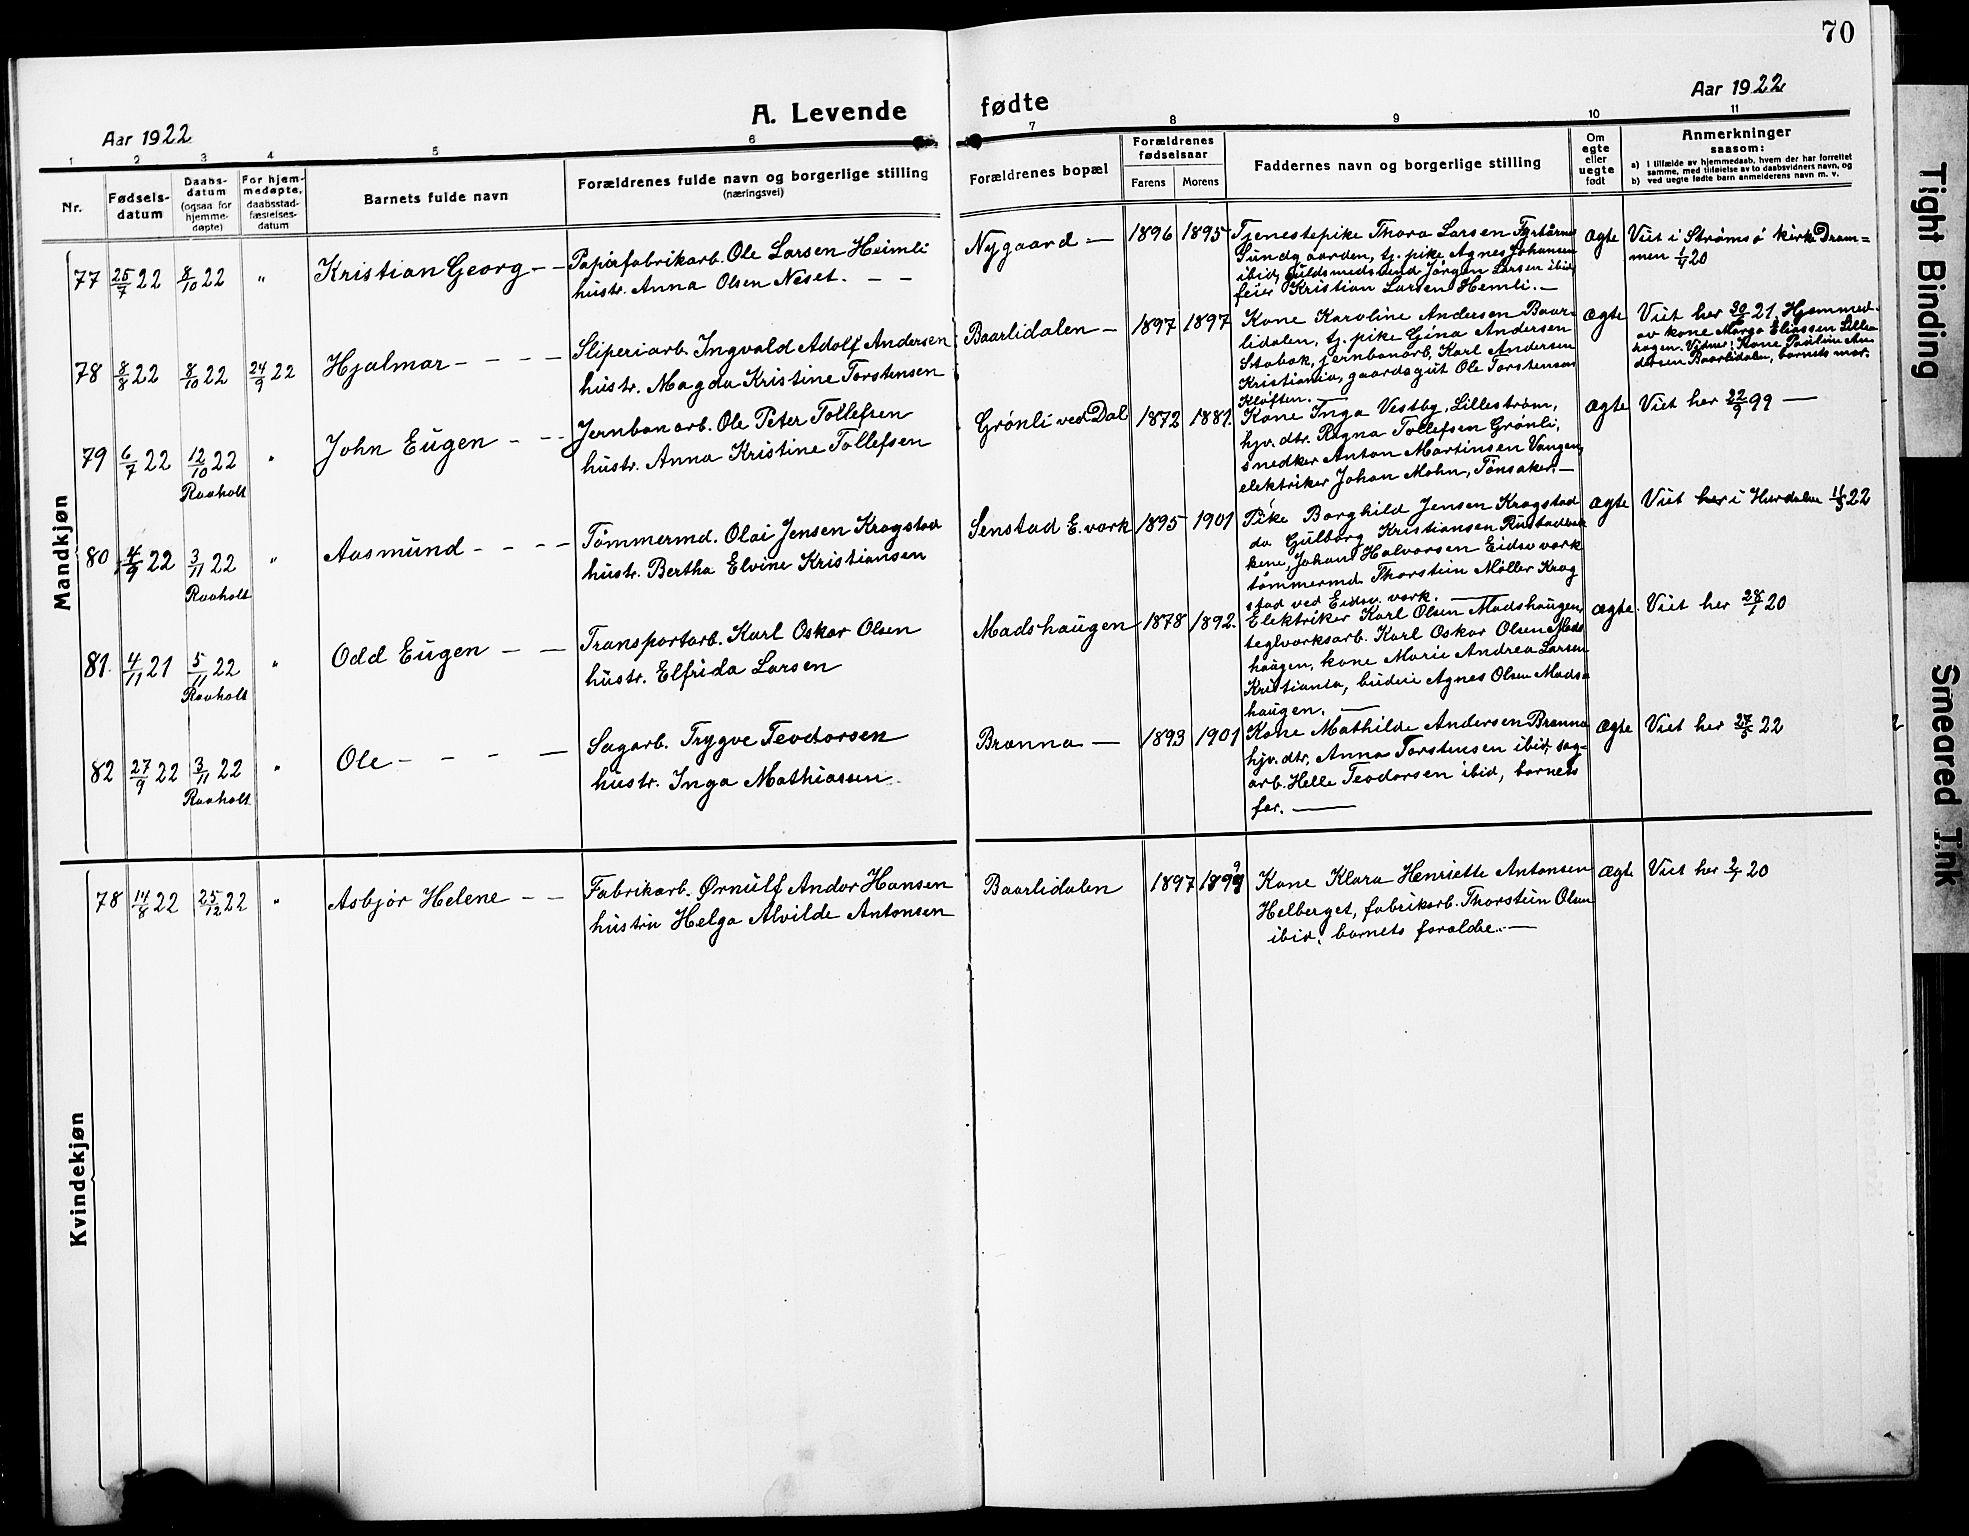 SAO, Eidsvoll prestekontor Kirkebøker, G/Ga/L0010: Parish register (copy) no. I 10, 1919-1929, p. 70